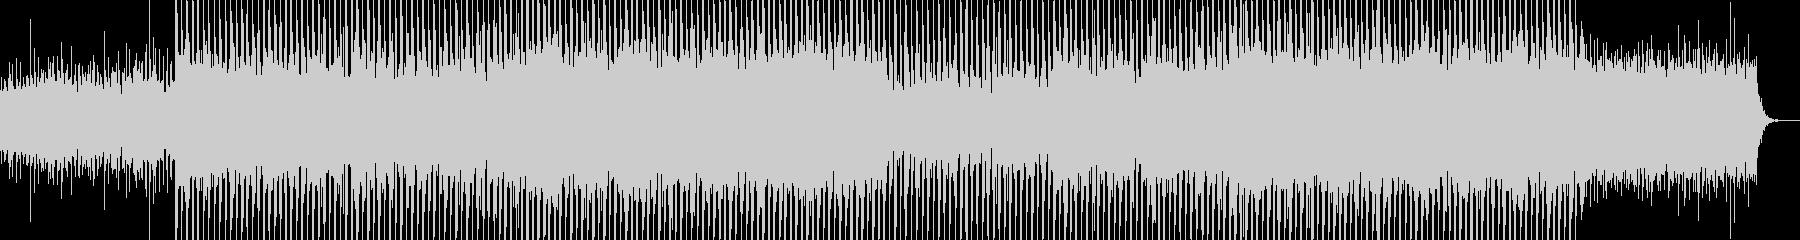 EDMポップで明るいクラブ系-42の未再生の波形